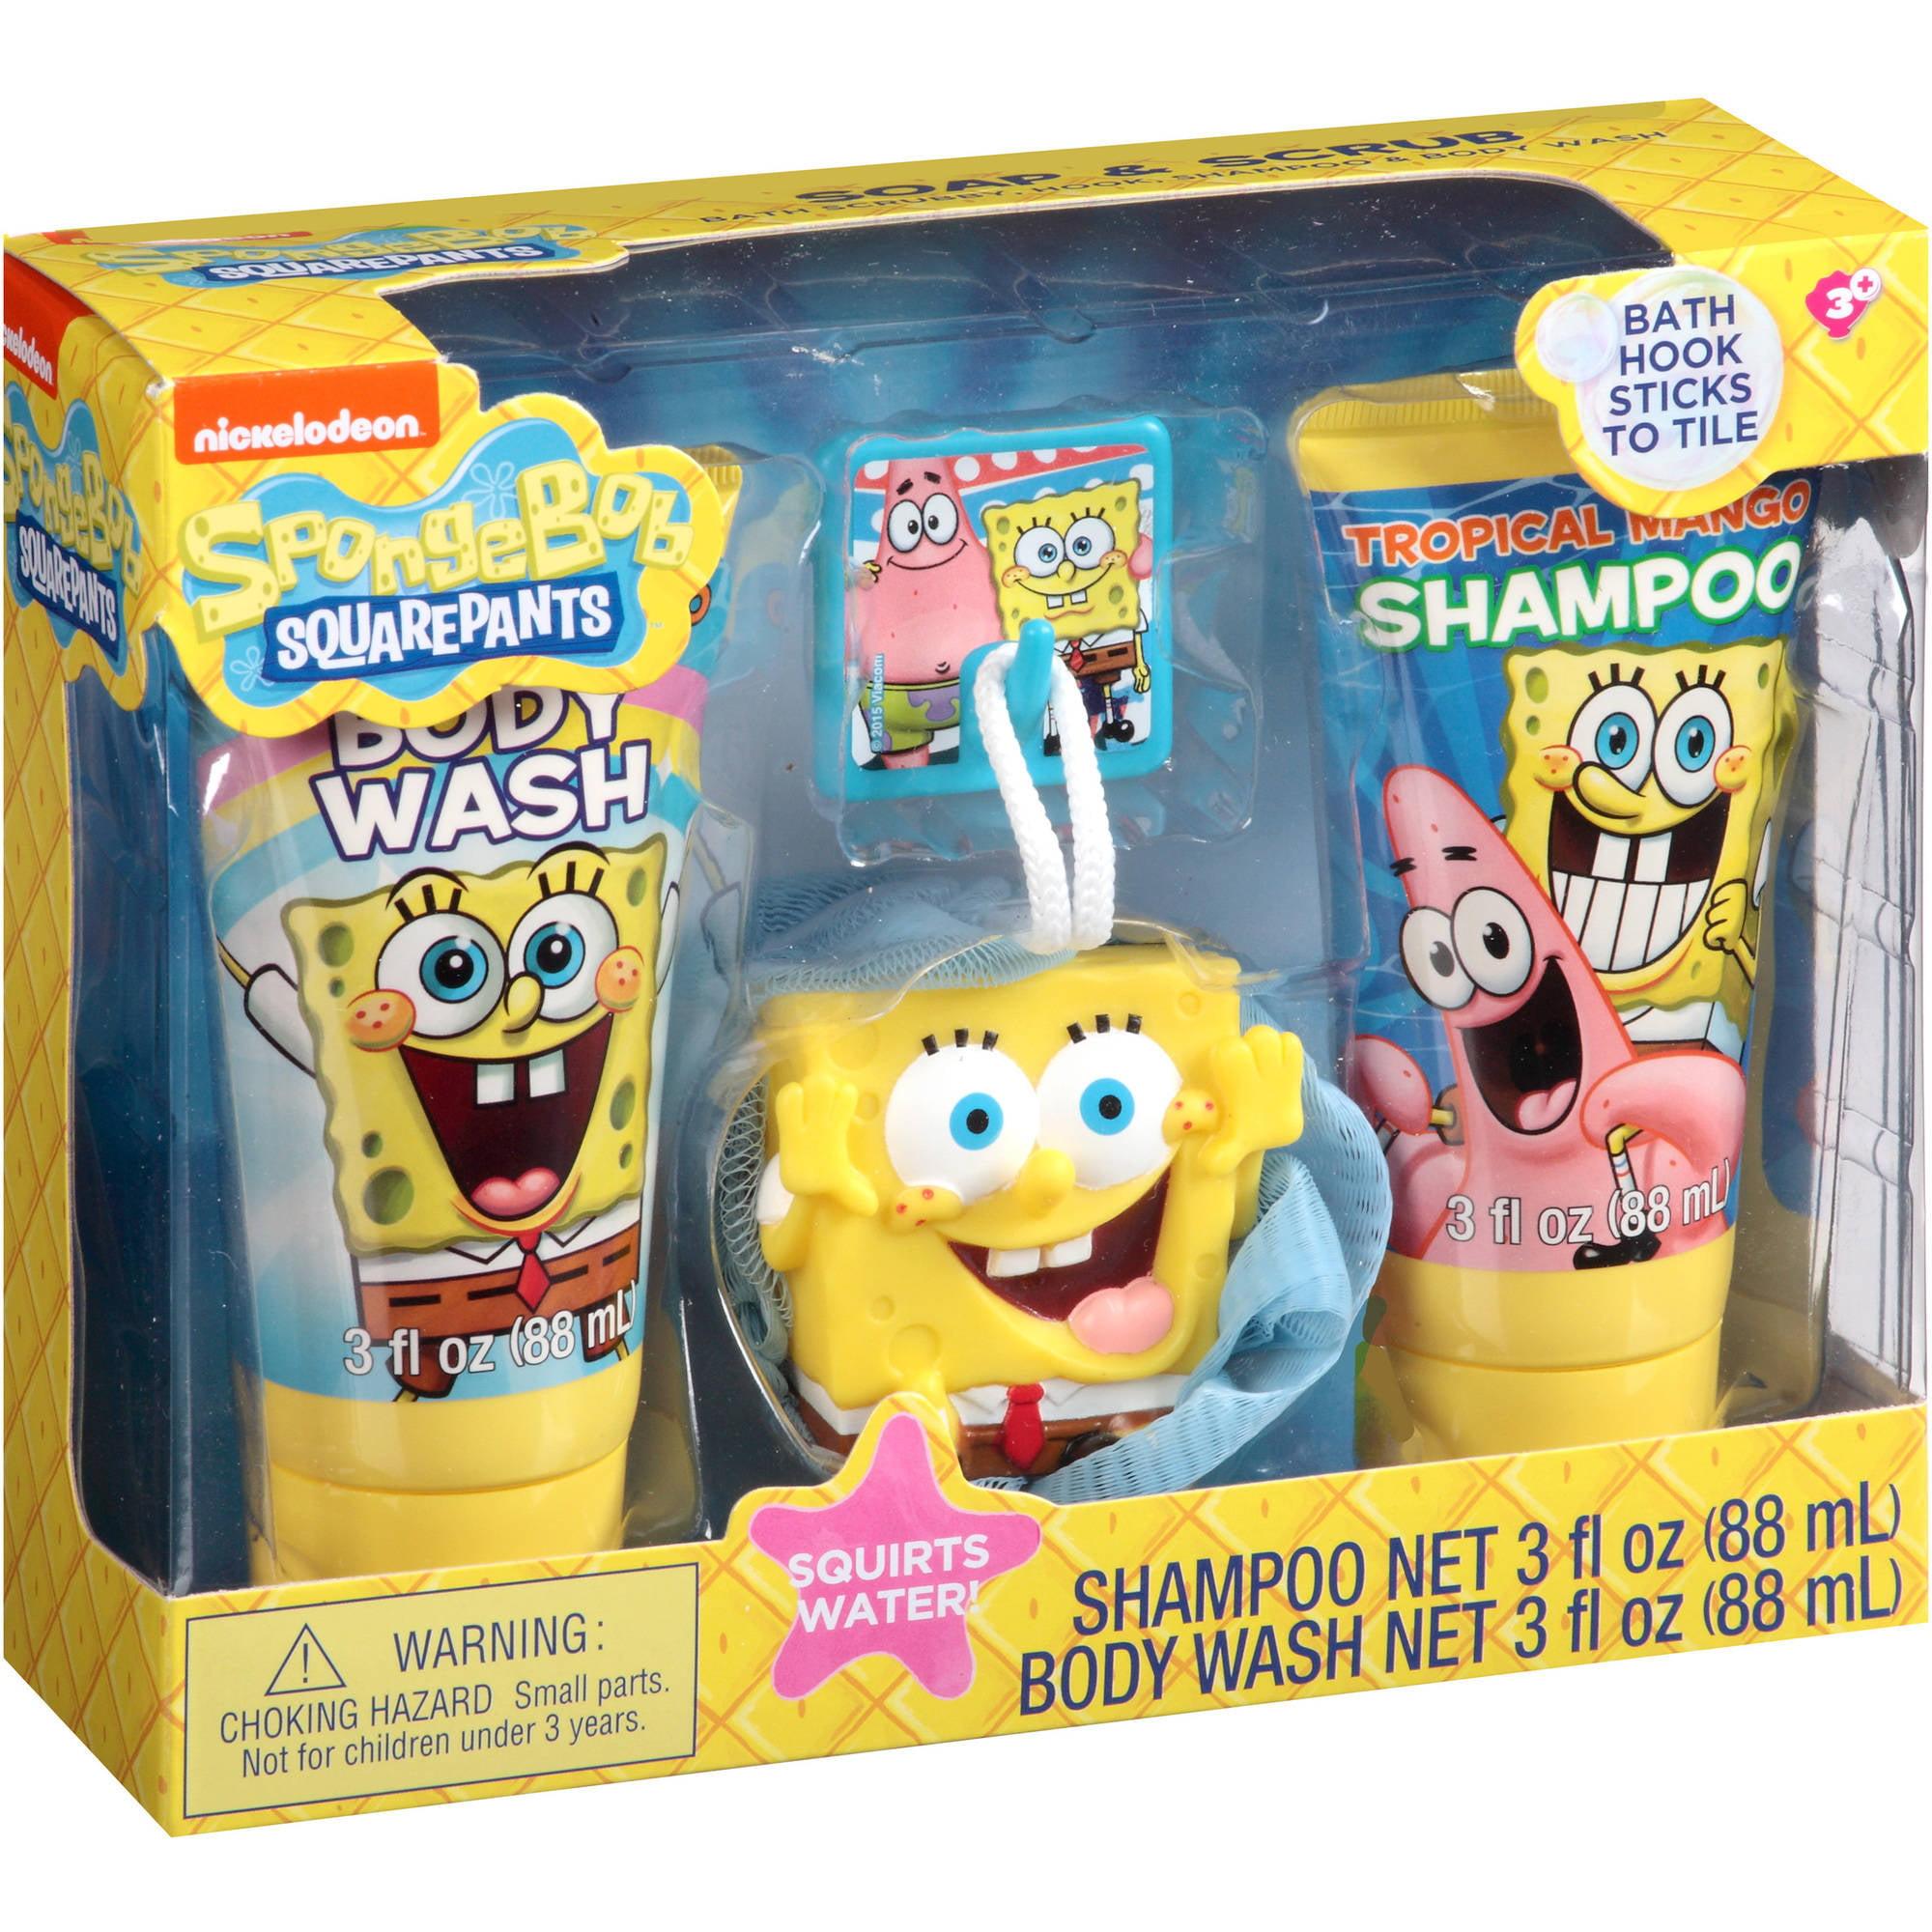 Spongebob squarepants bathroom accessories - Spongebob Squarepants Bathroom Accessories 22